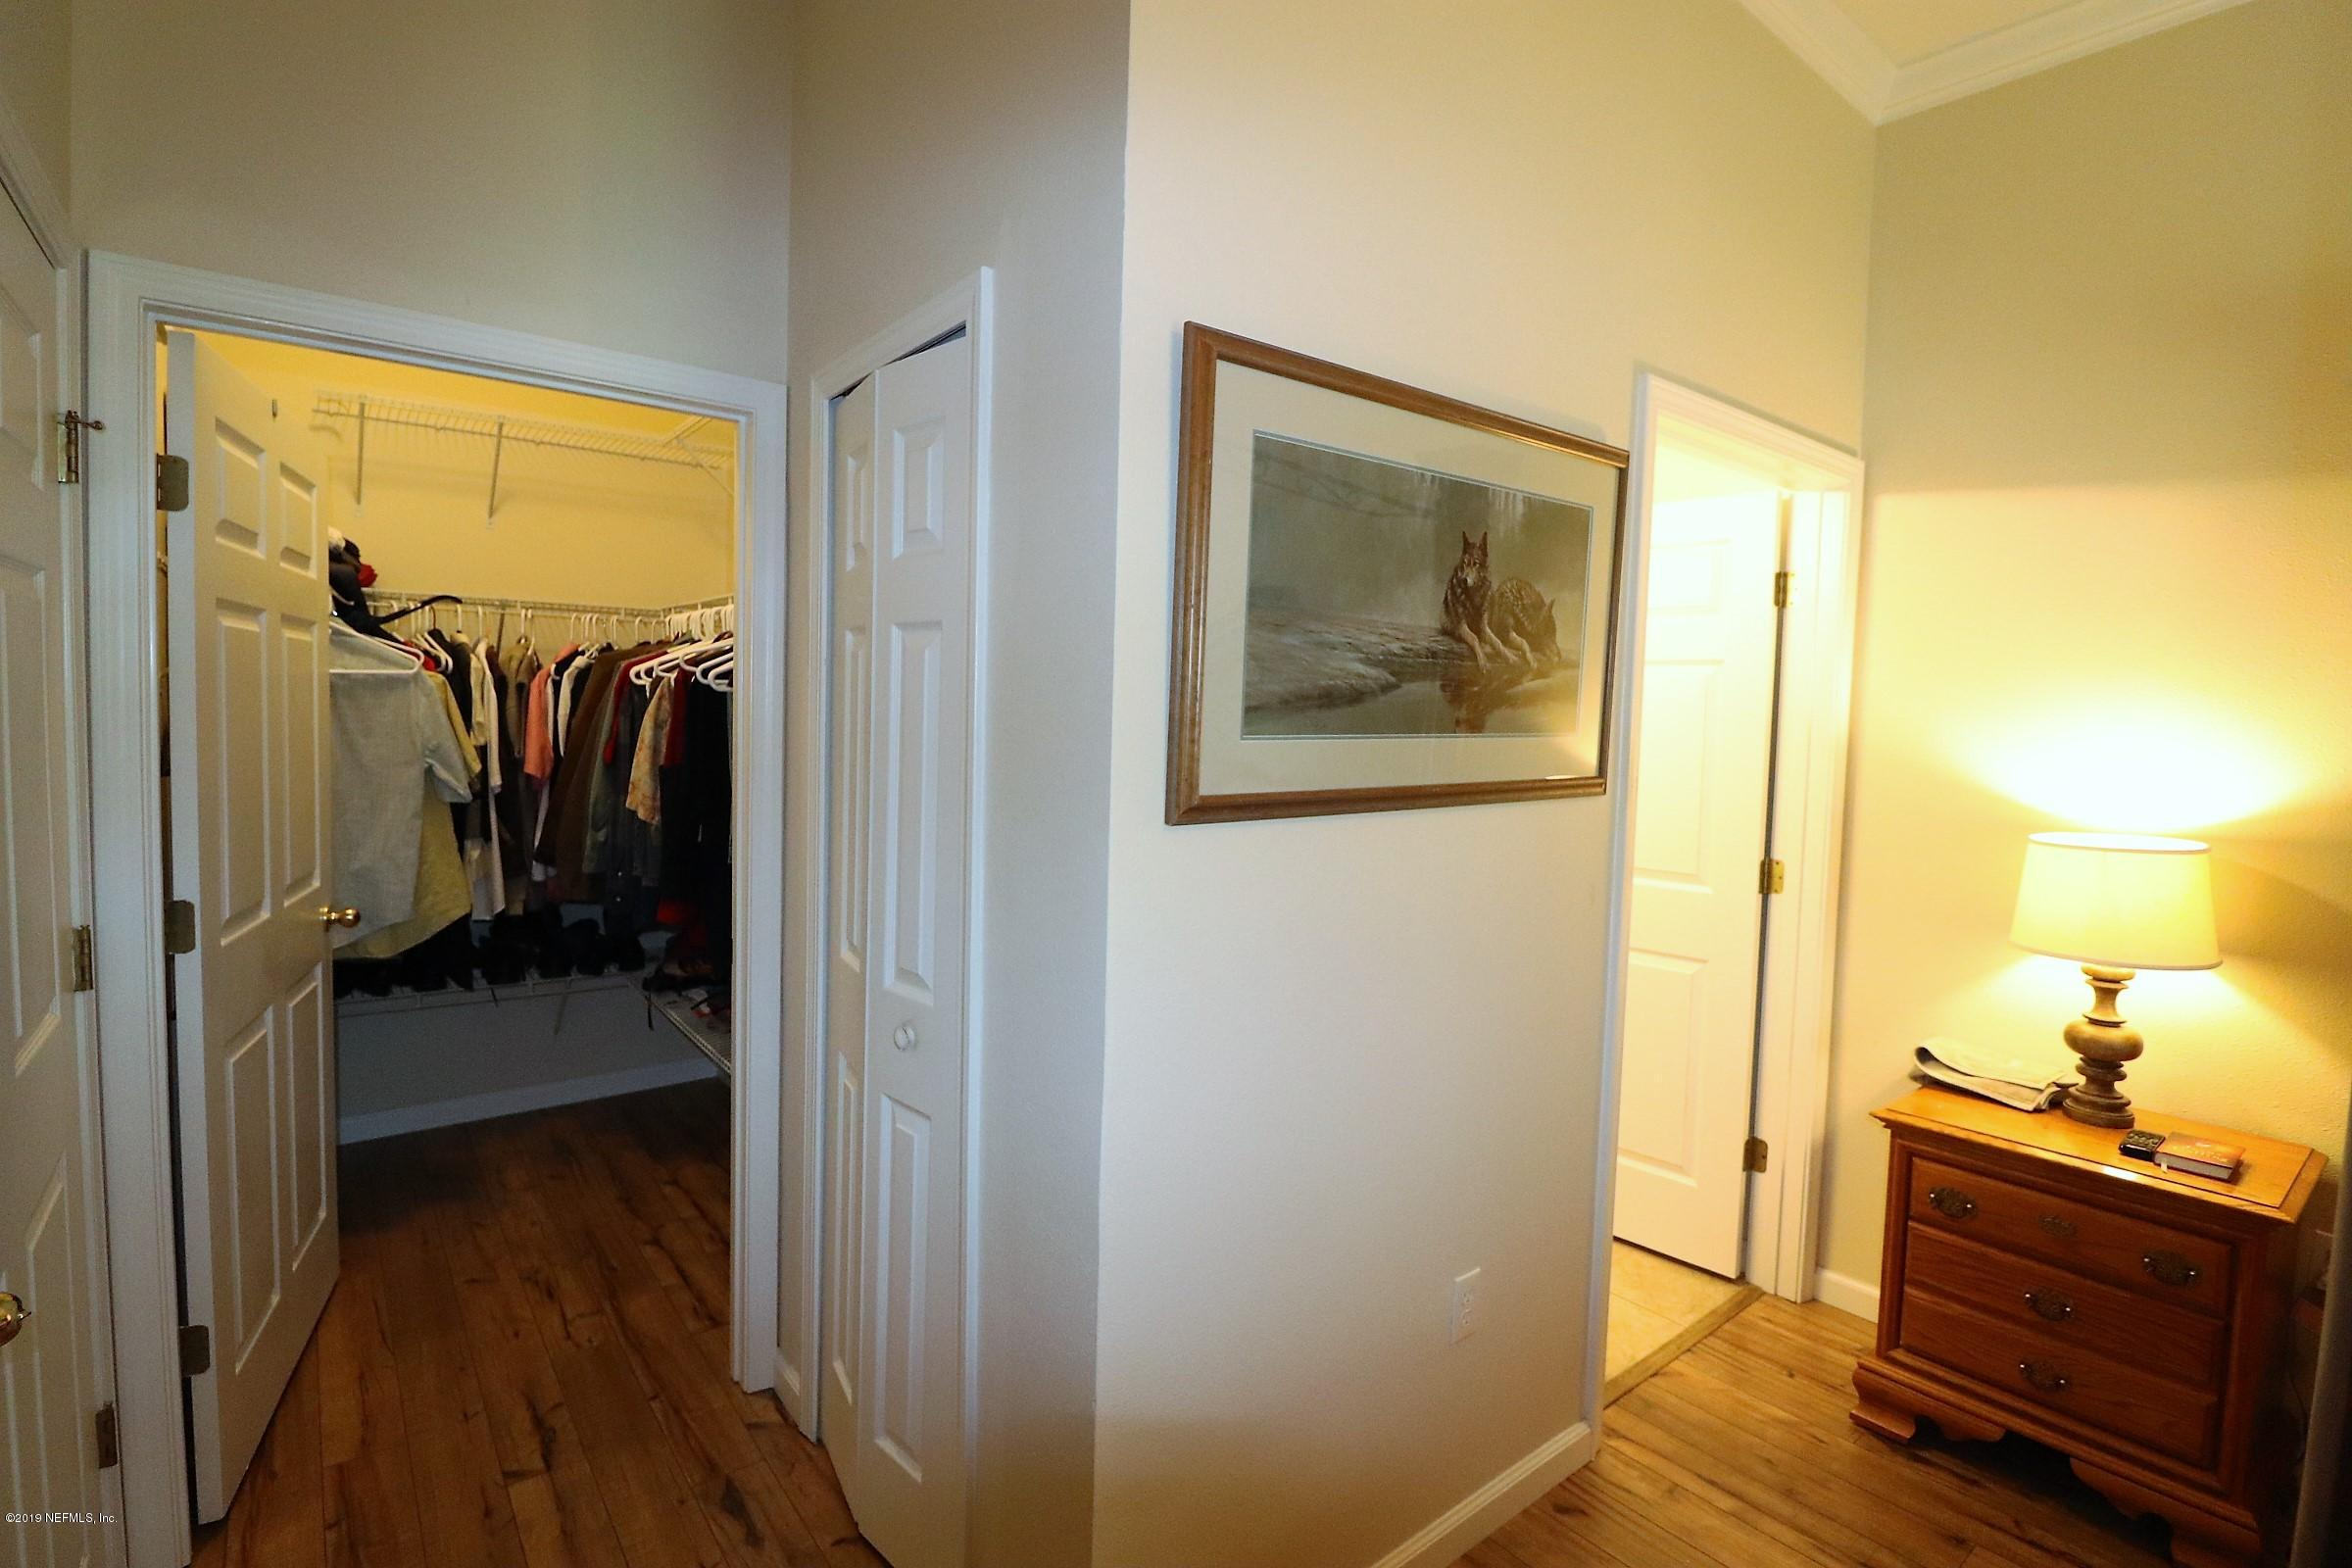 9420 OSPREY BRANCH, JACKSONVILLE, FLORIDA 32257, 3 Bedrooms Bedrooms, ,2 BathroomsBathrooms,Condo,For sale,OSPREY BRANCH,1018374